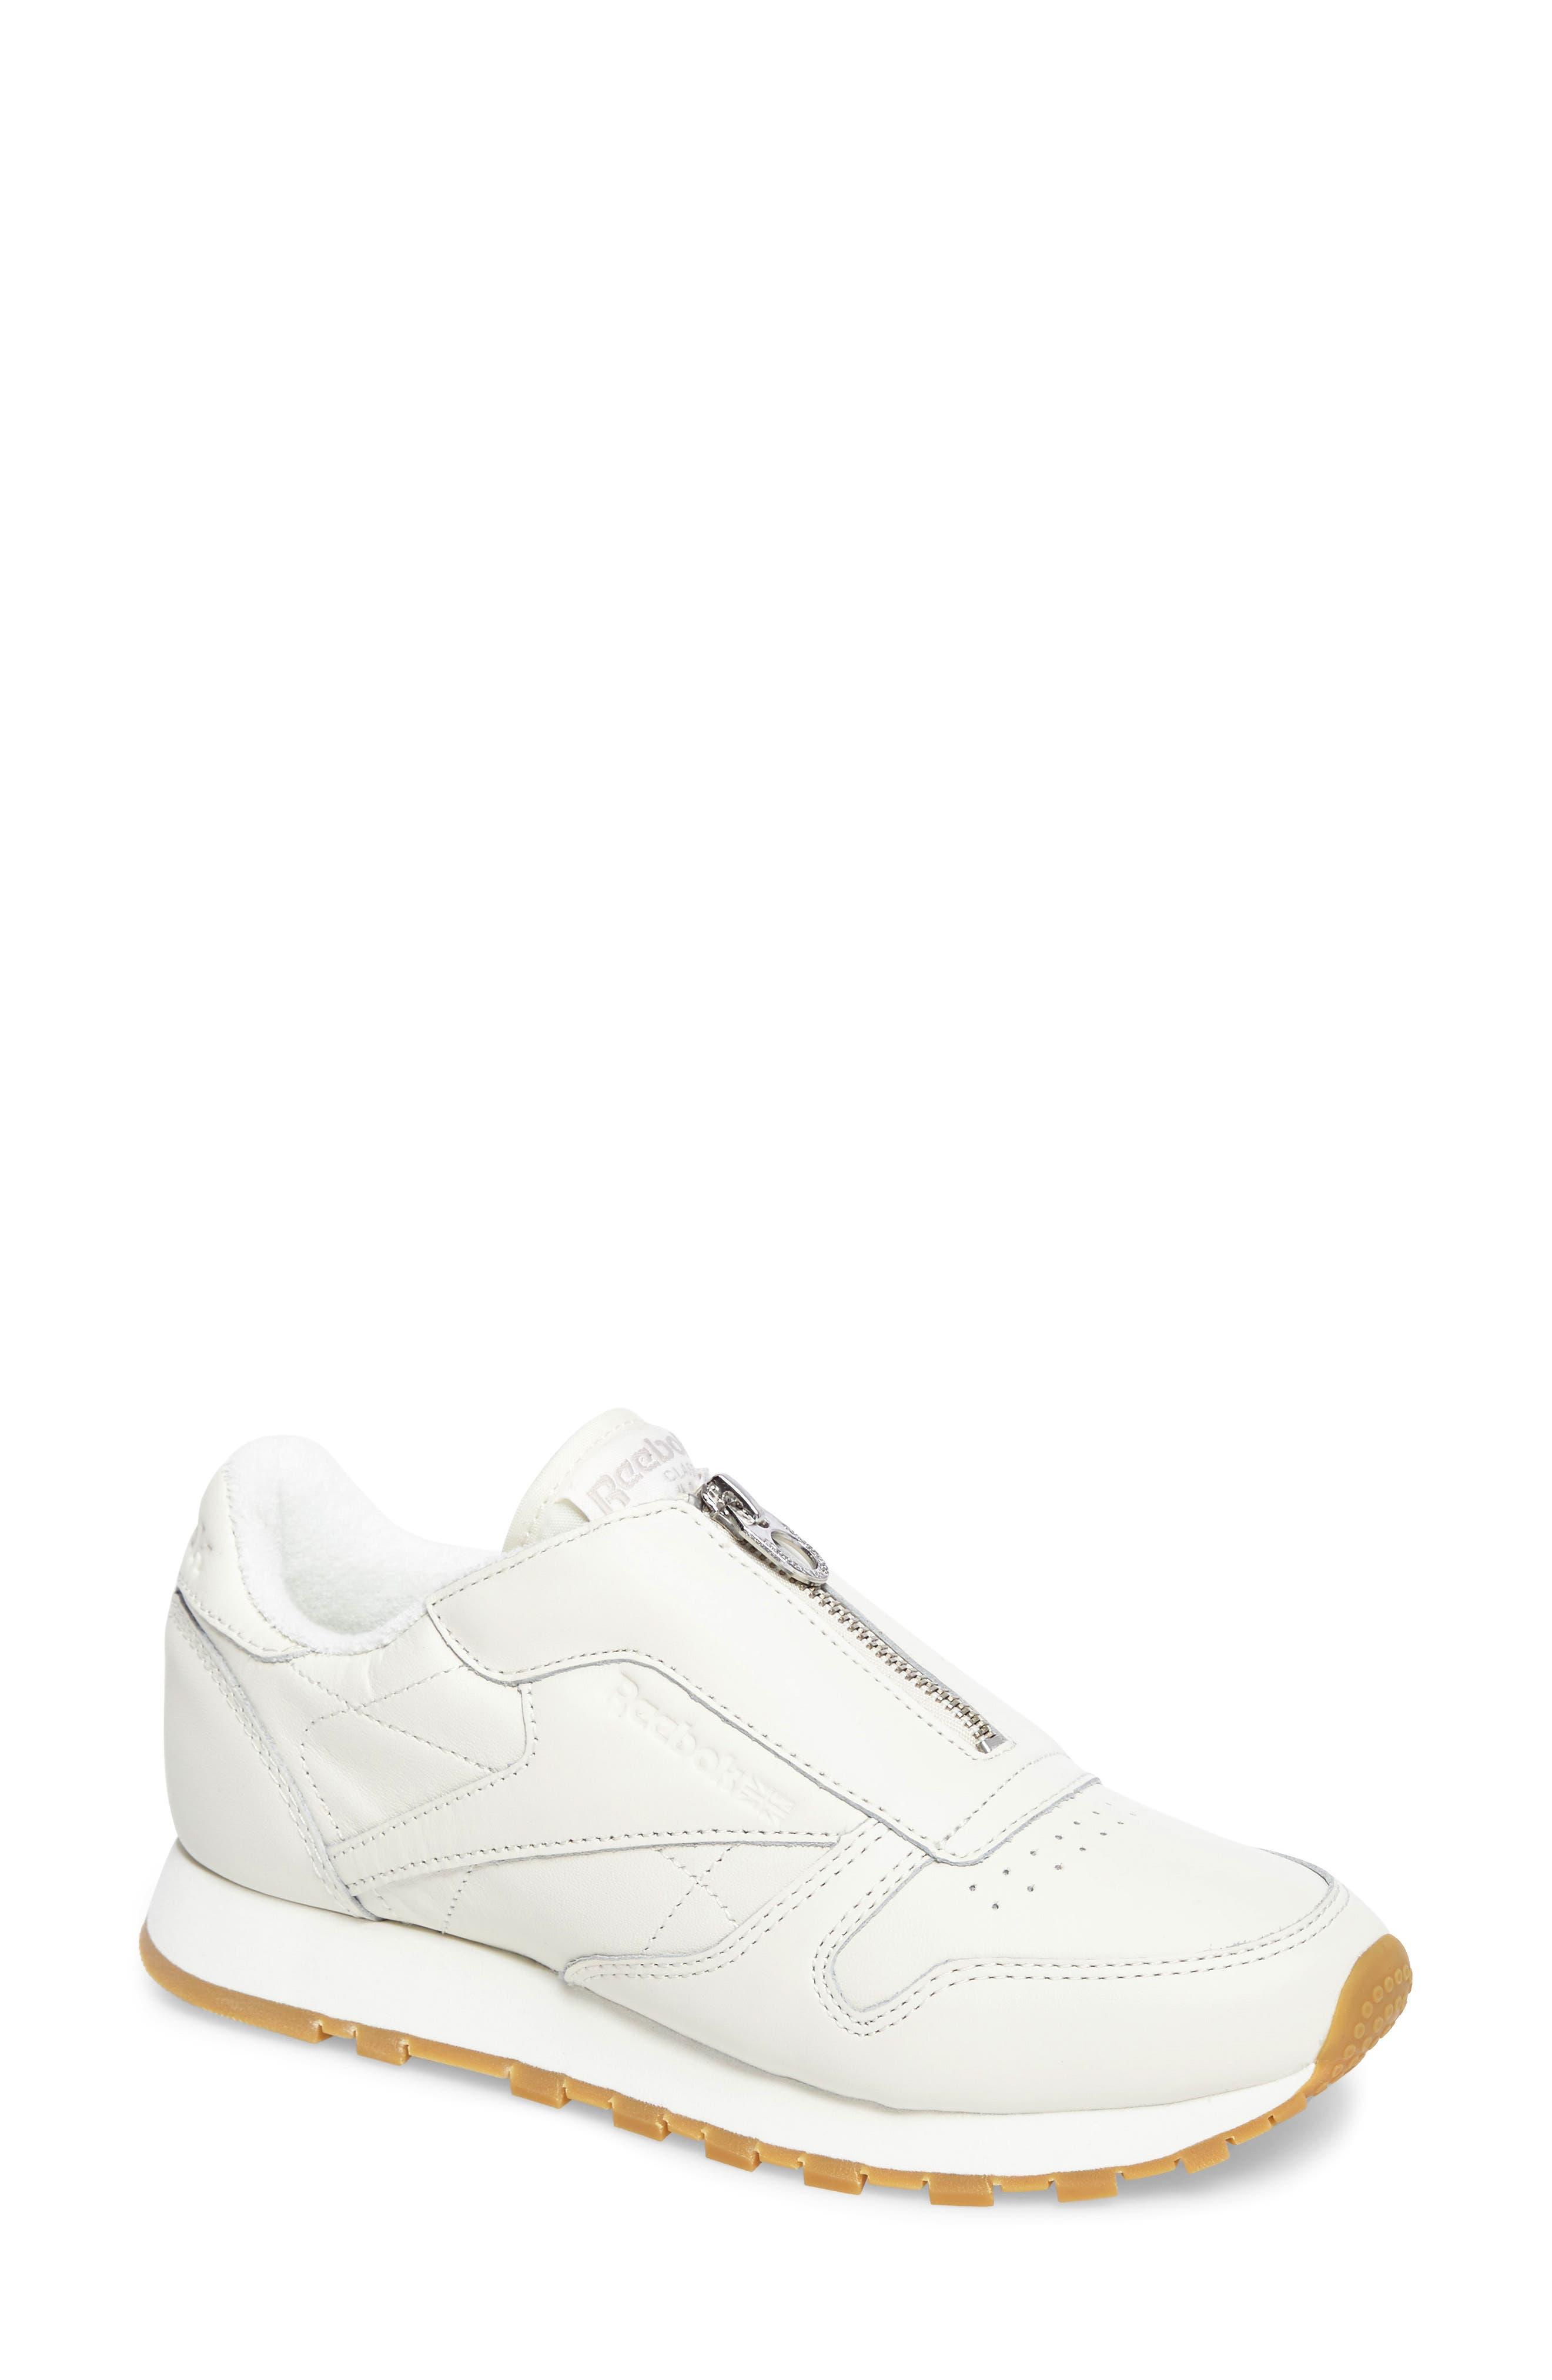 Alternate Image 1 Selected - Reebok Classic Leather Zip Sneaker (Women)